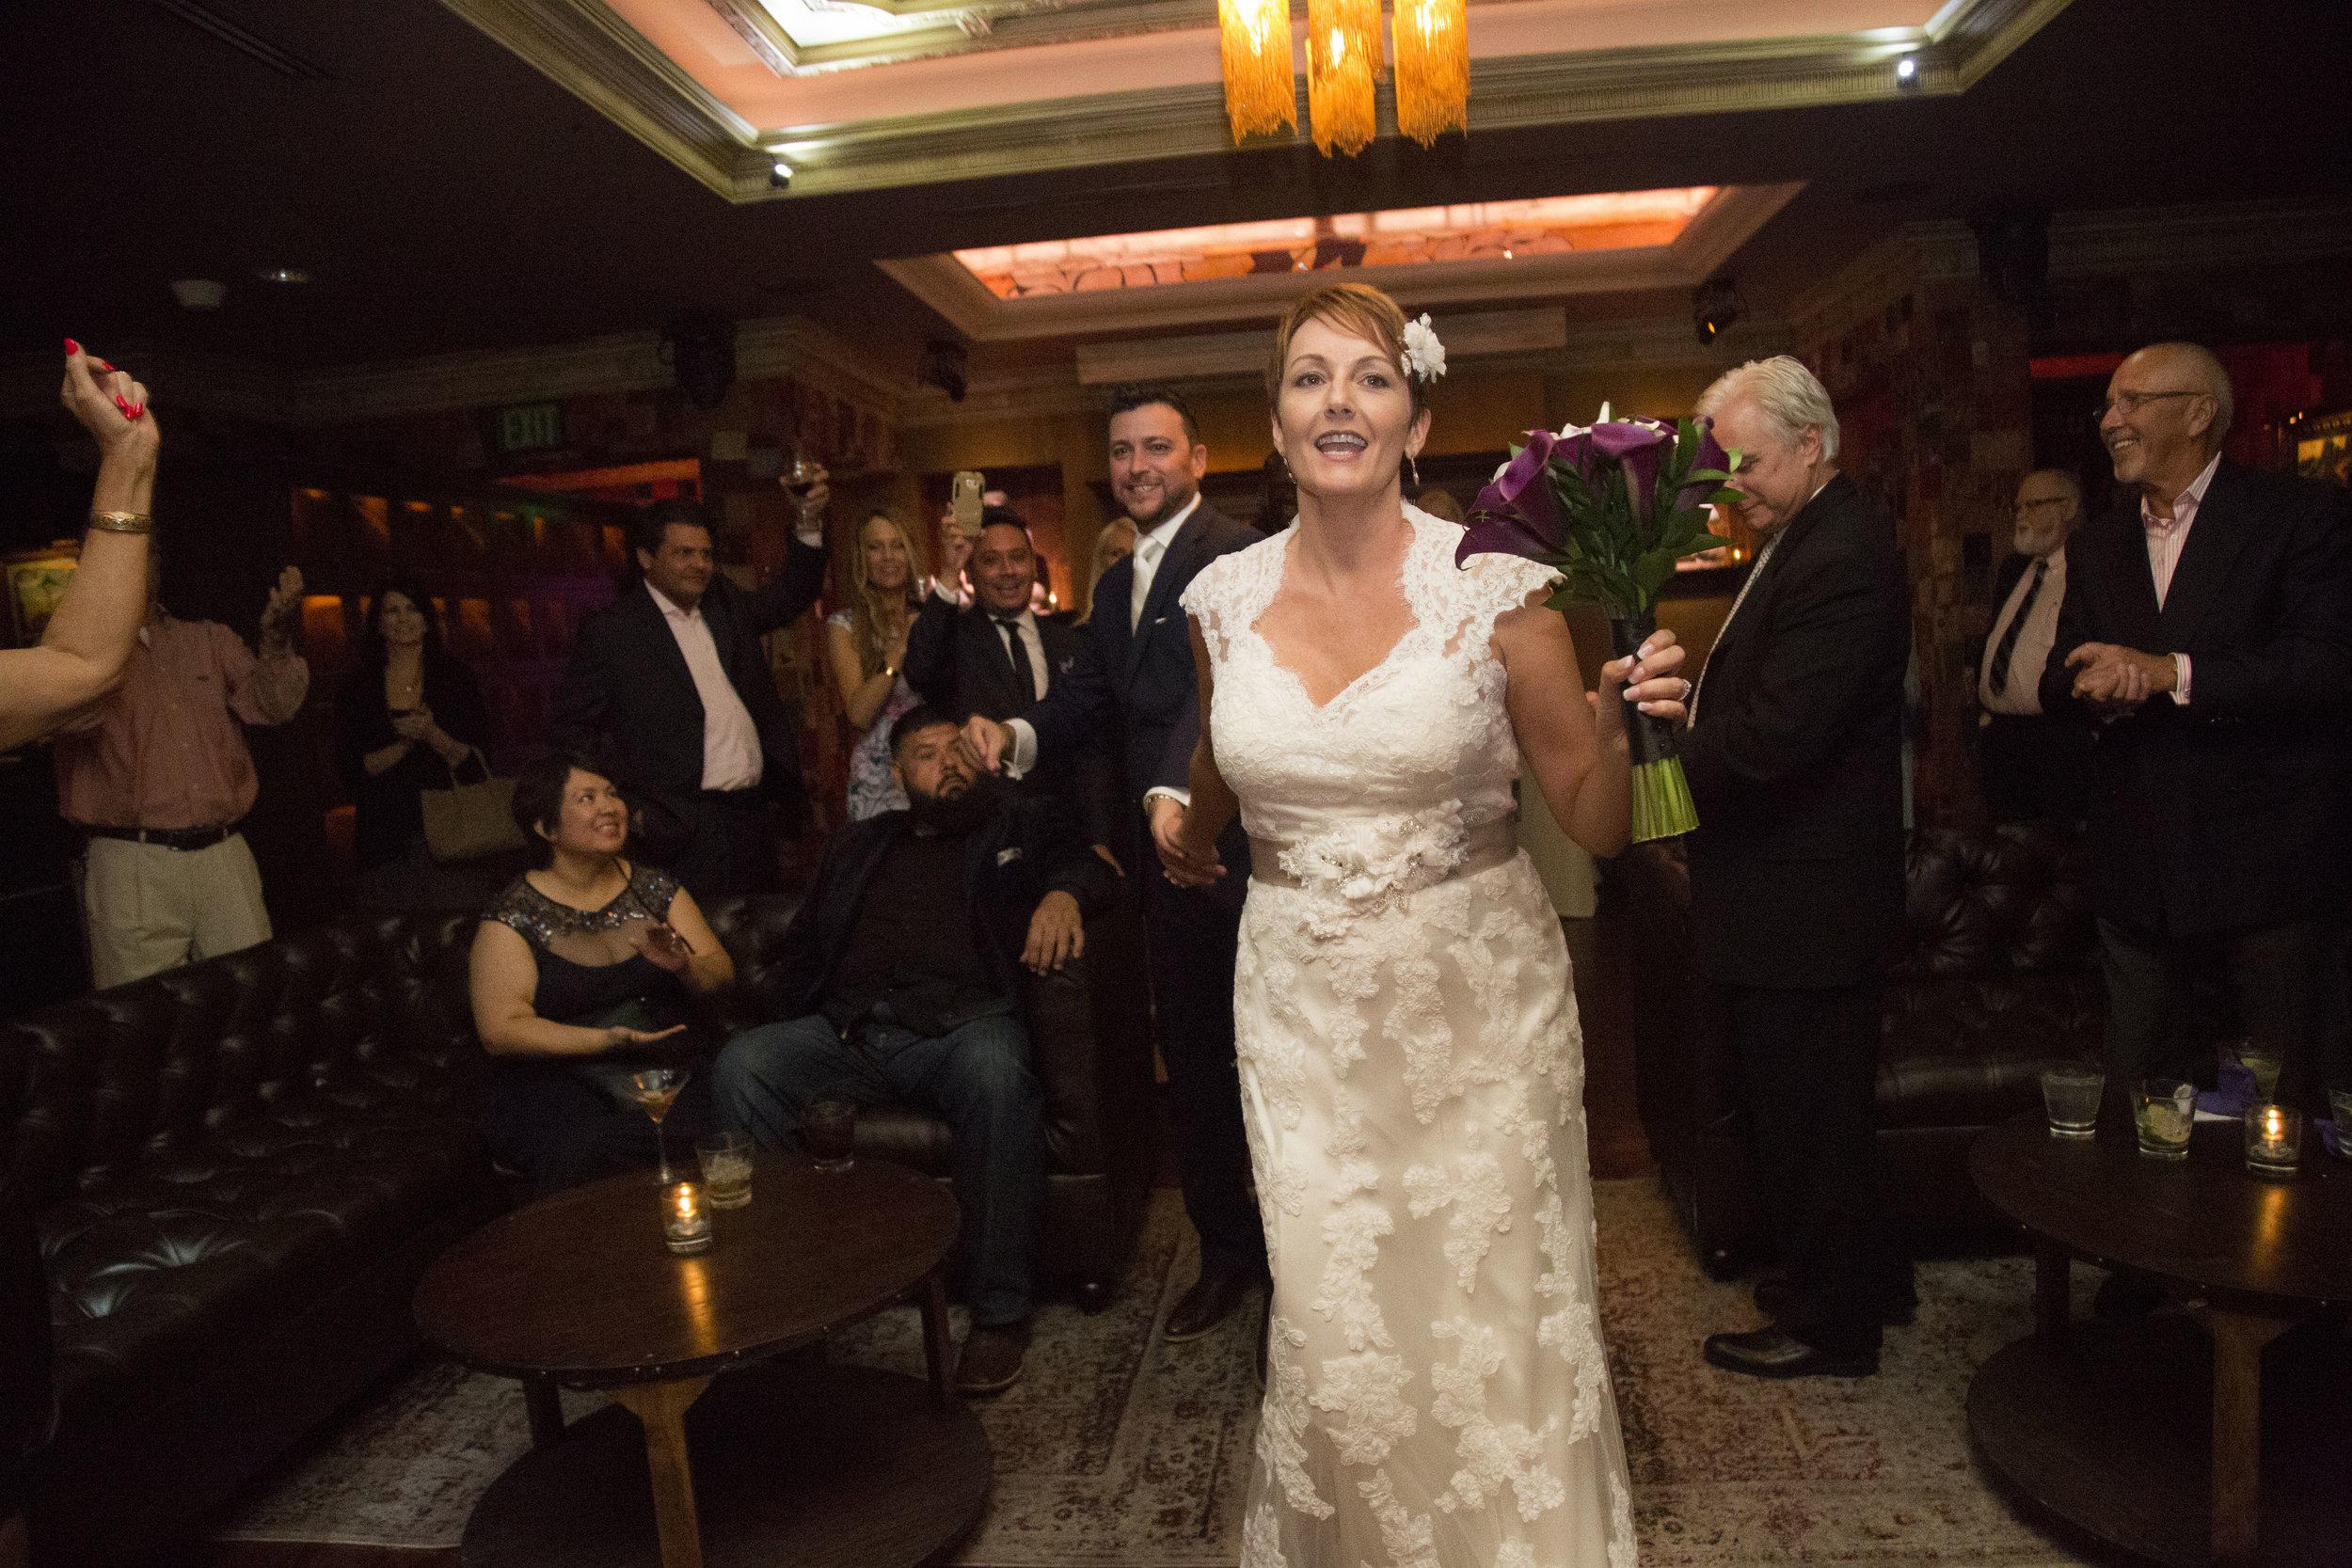 ATGI_Kat and Gabe Wedding 2016_2S8A5660.jpg